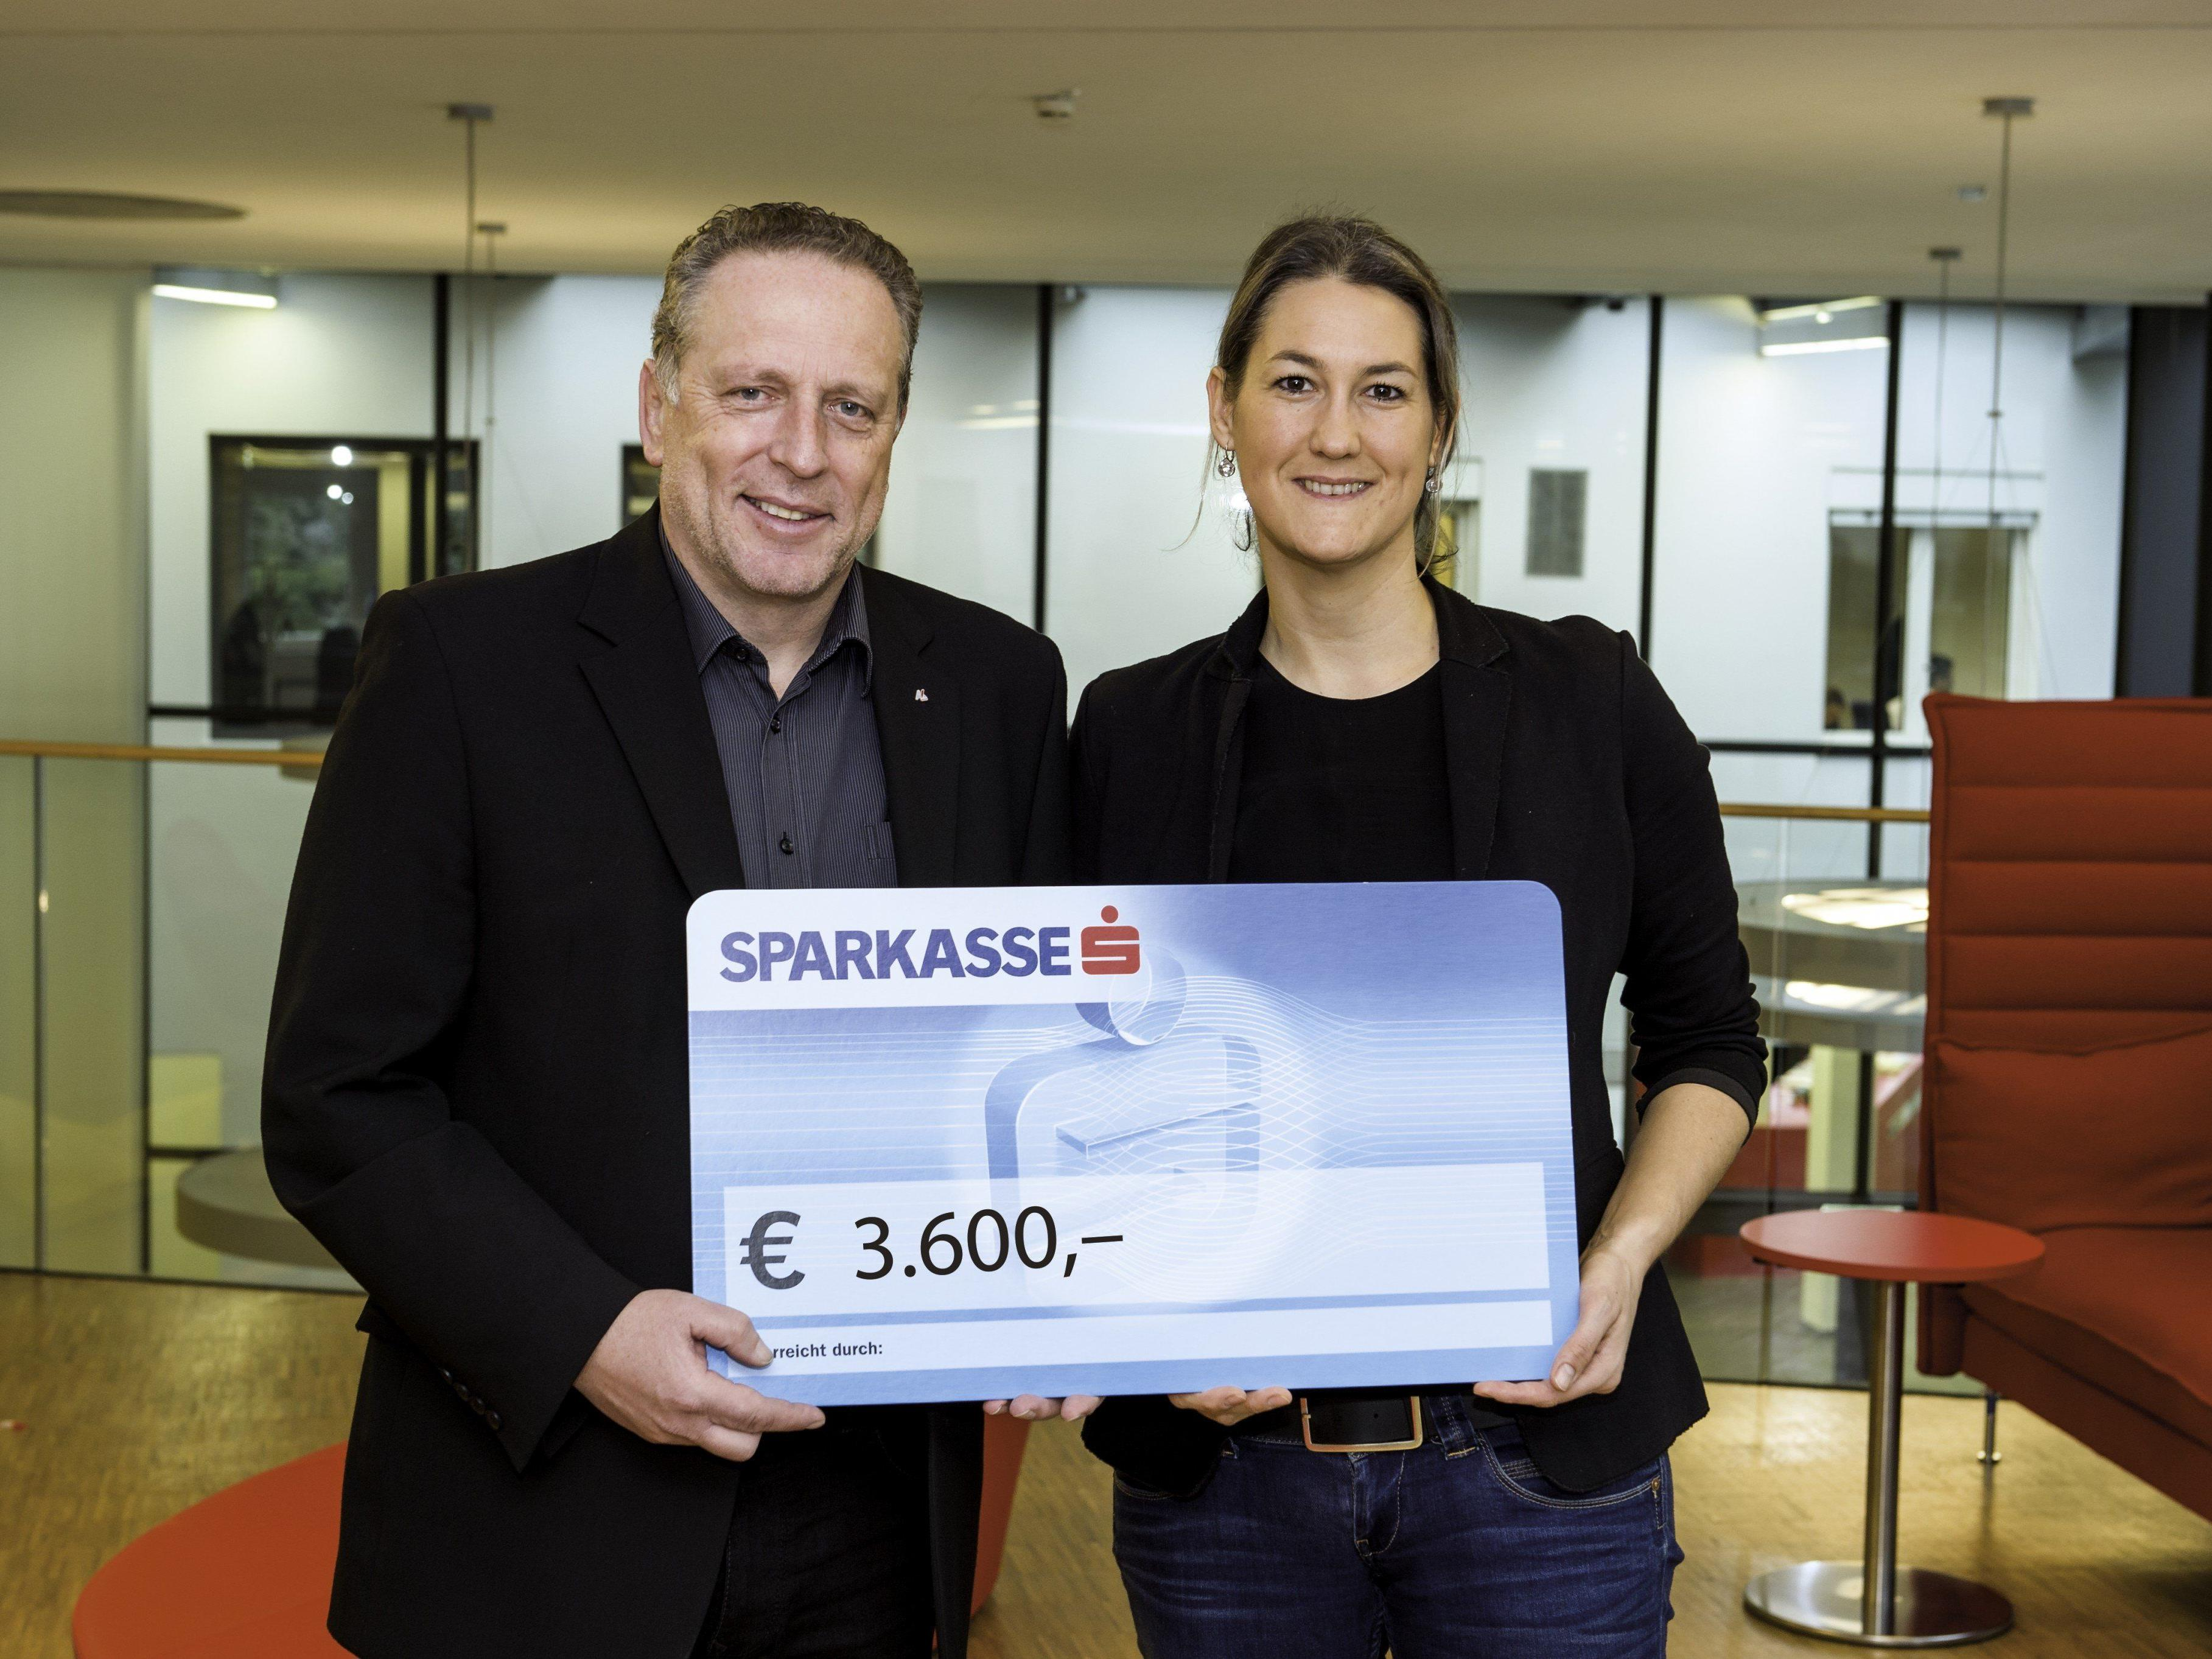 AK-Präsident Hubert Hämmerle konnte heuer 3600 Euro an Manuela Ortner übergeben.